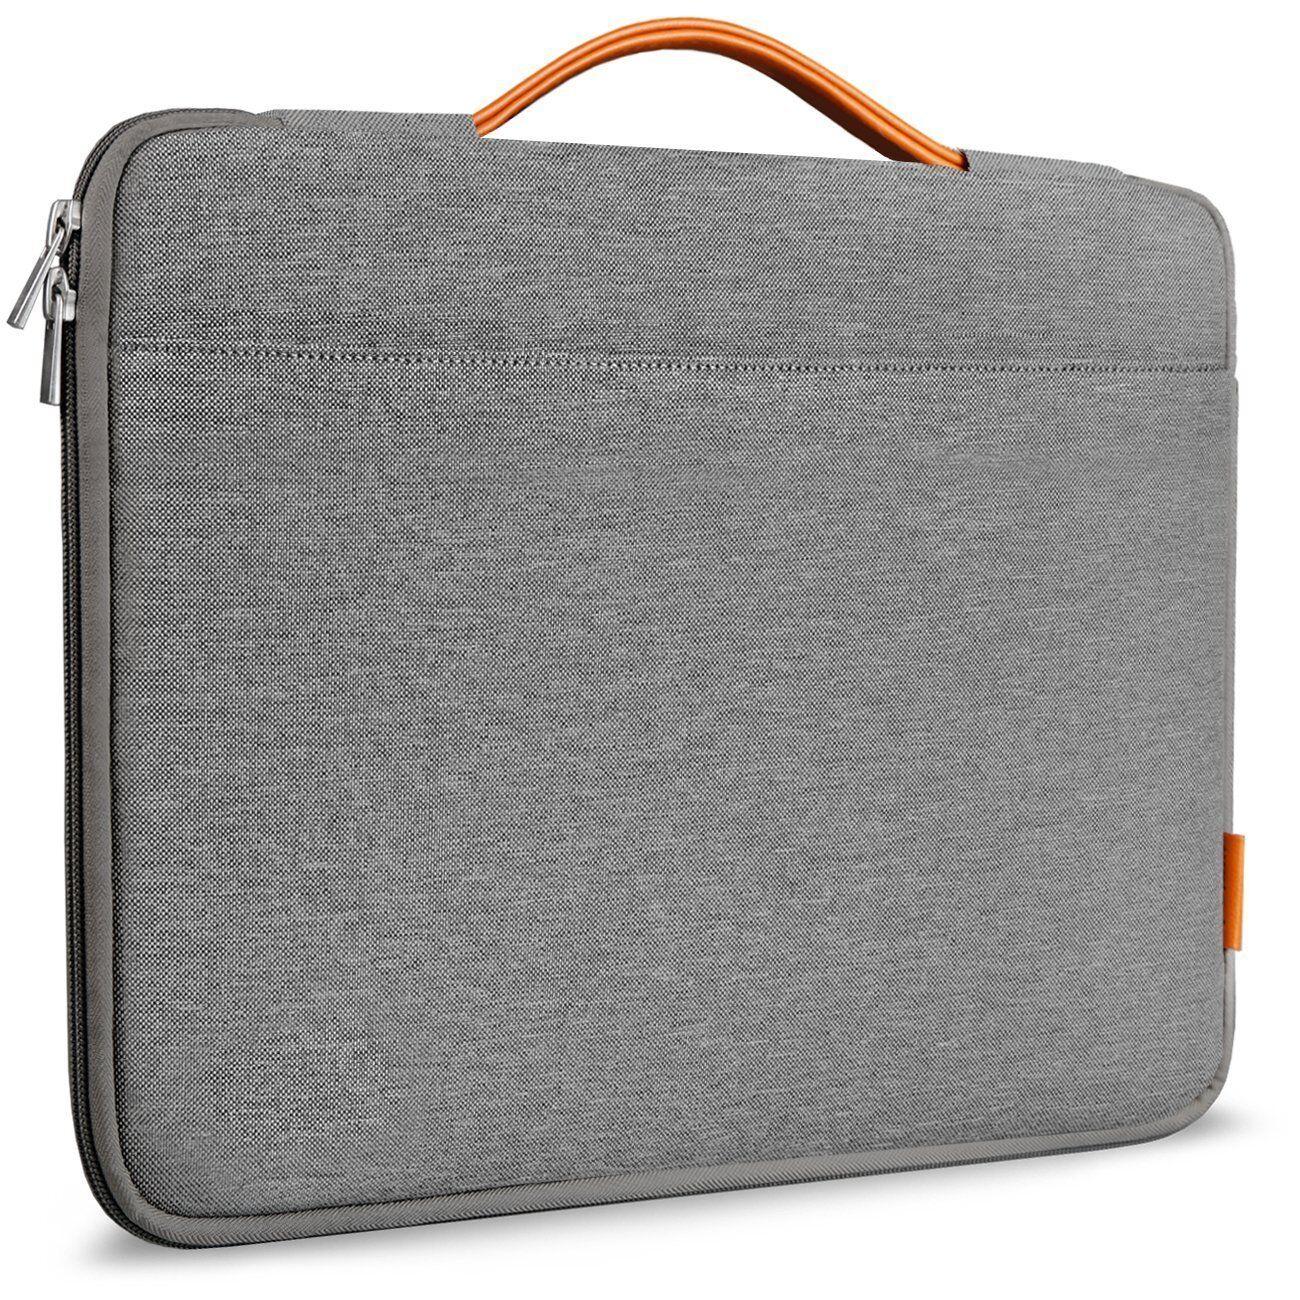 inateck lb1301g 13 3 zoll tasche f r macbook air macbook pro pro retina grau. Black Bedroom Furniture Sets. Home Design Ideas